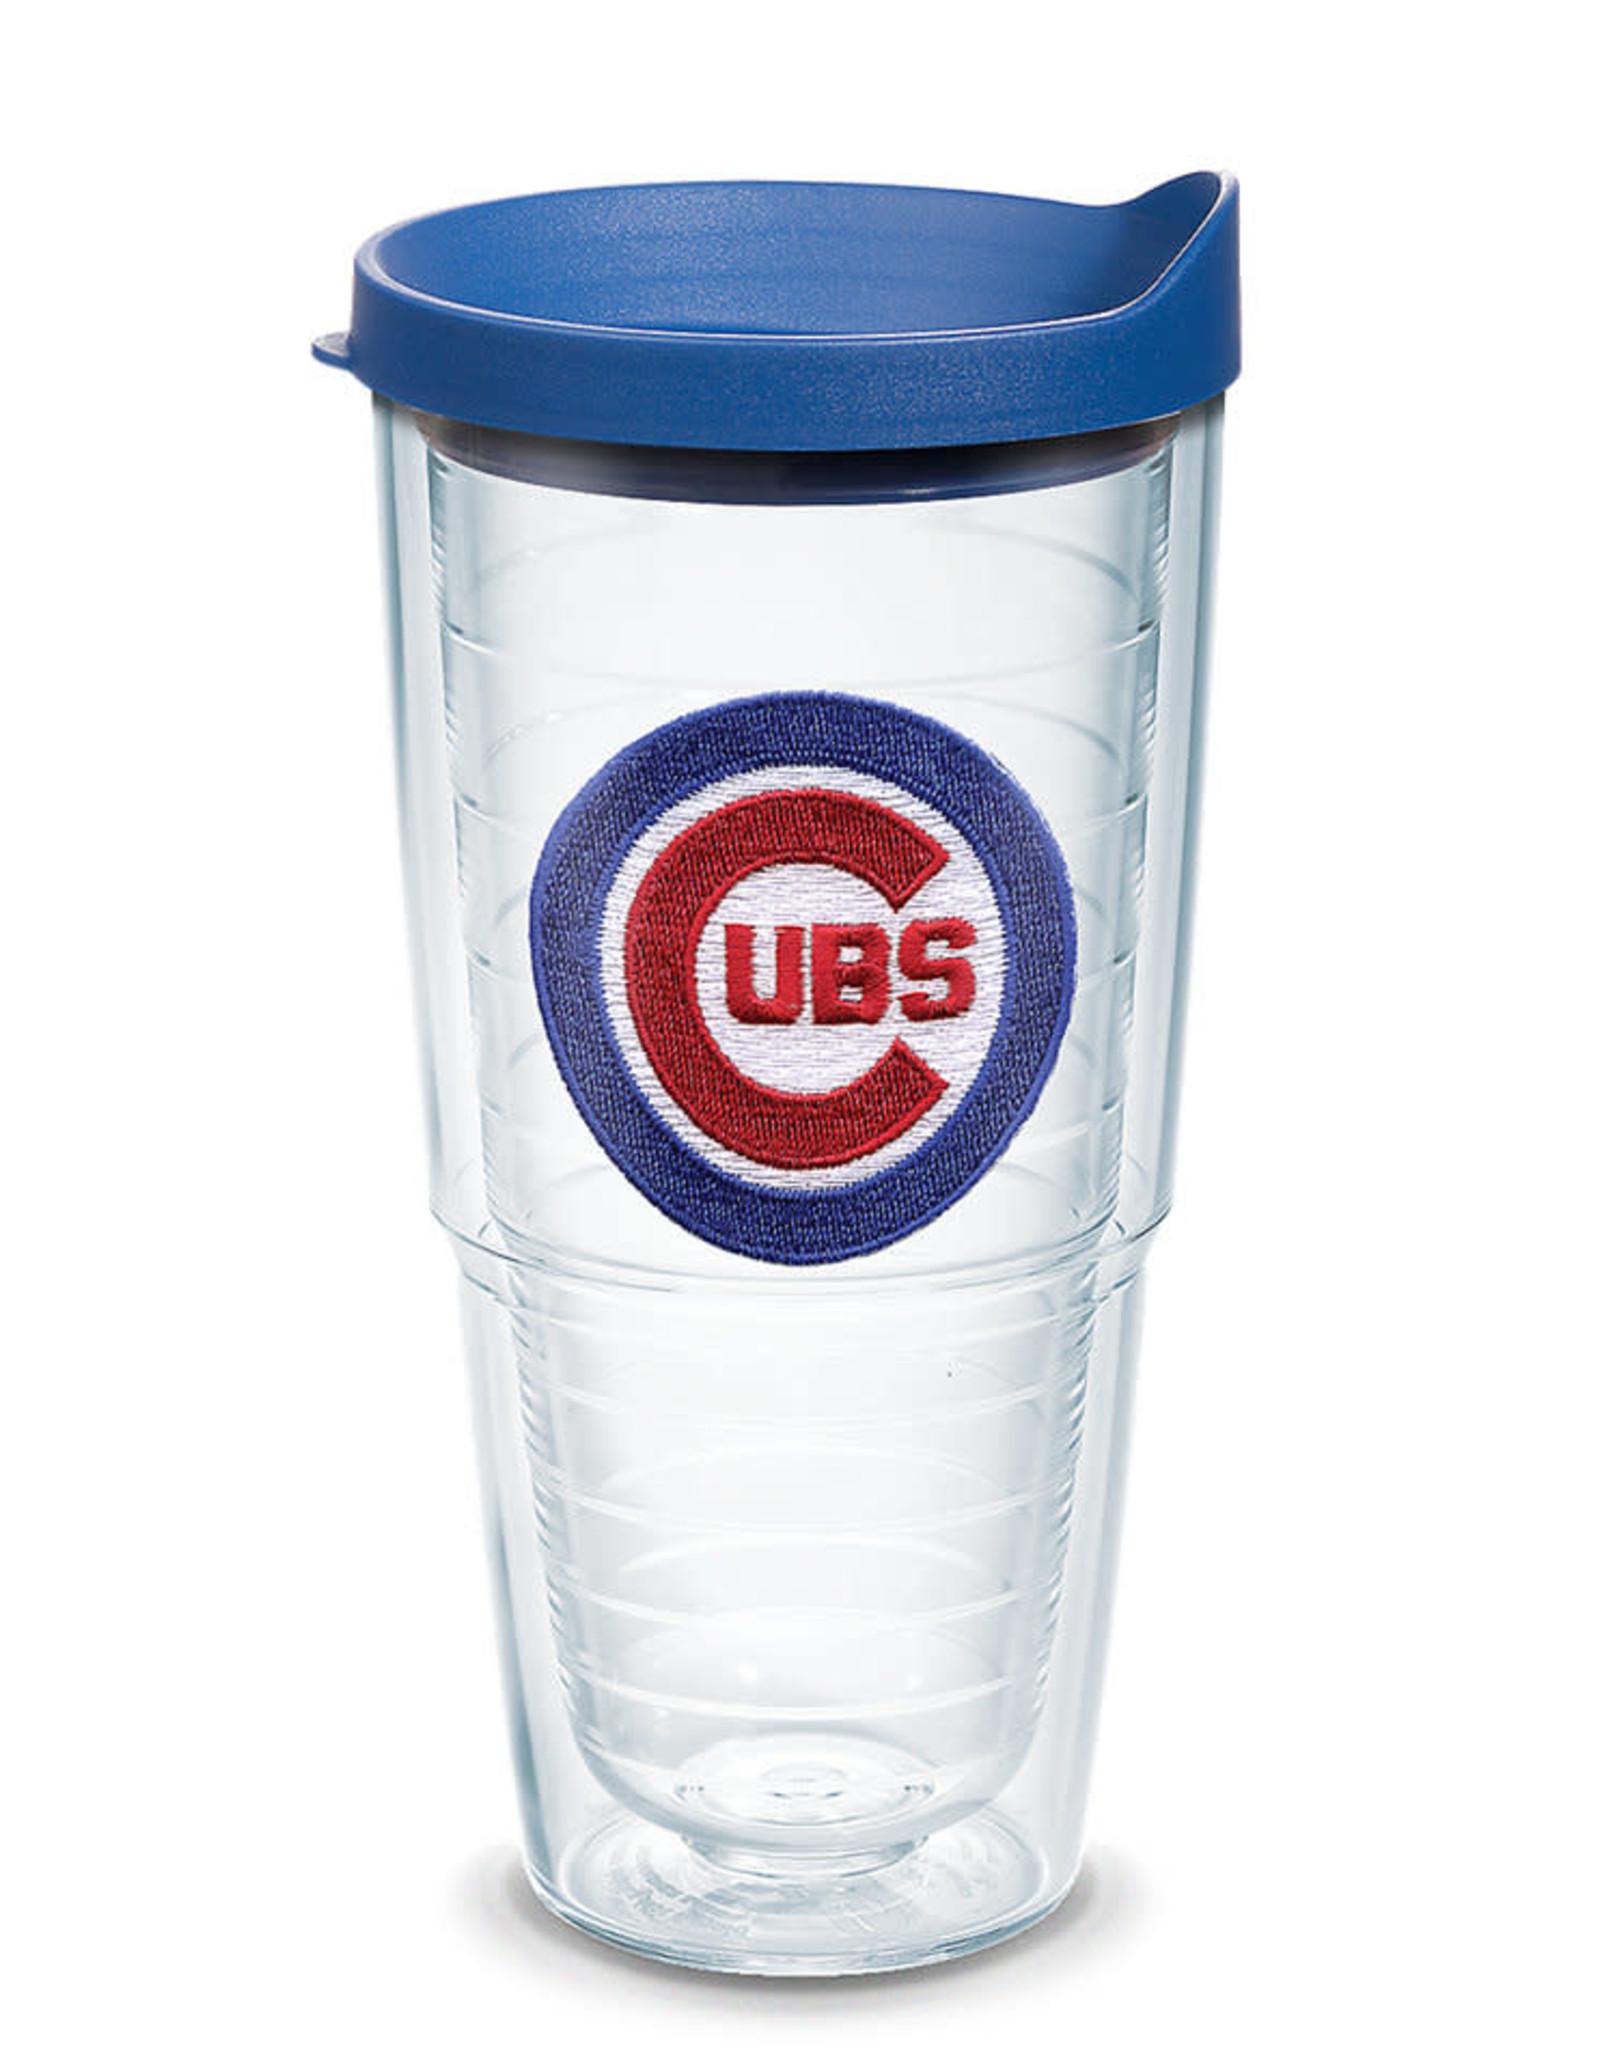 Tervis Tumbler 24oz w/lid Chicago Cubs Logo Blue Lid